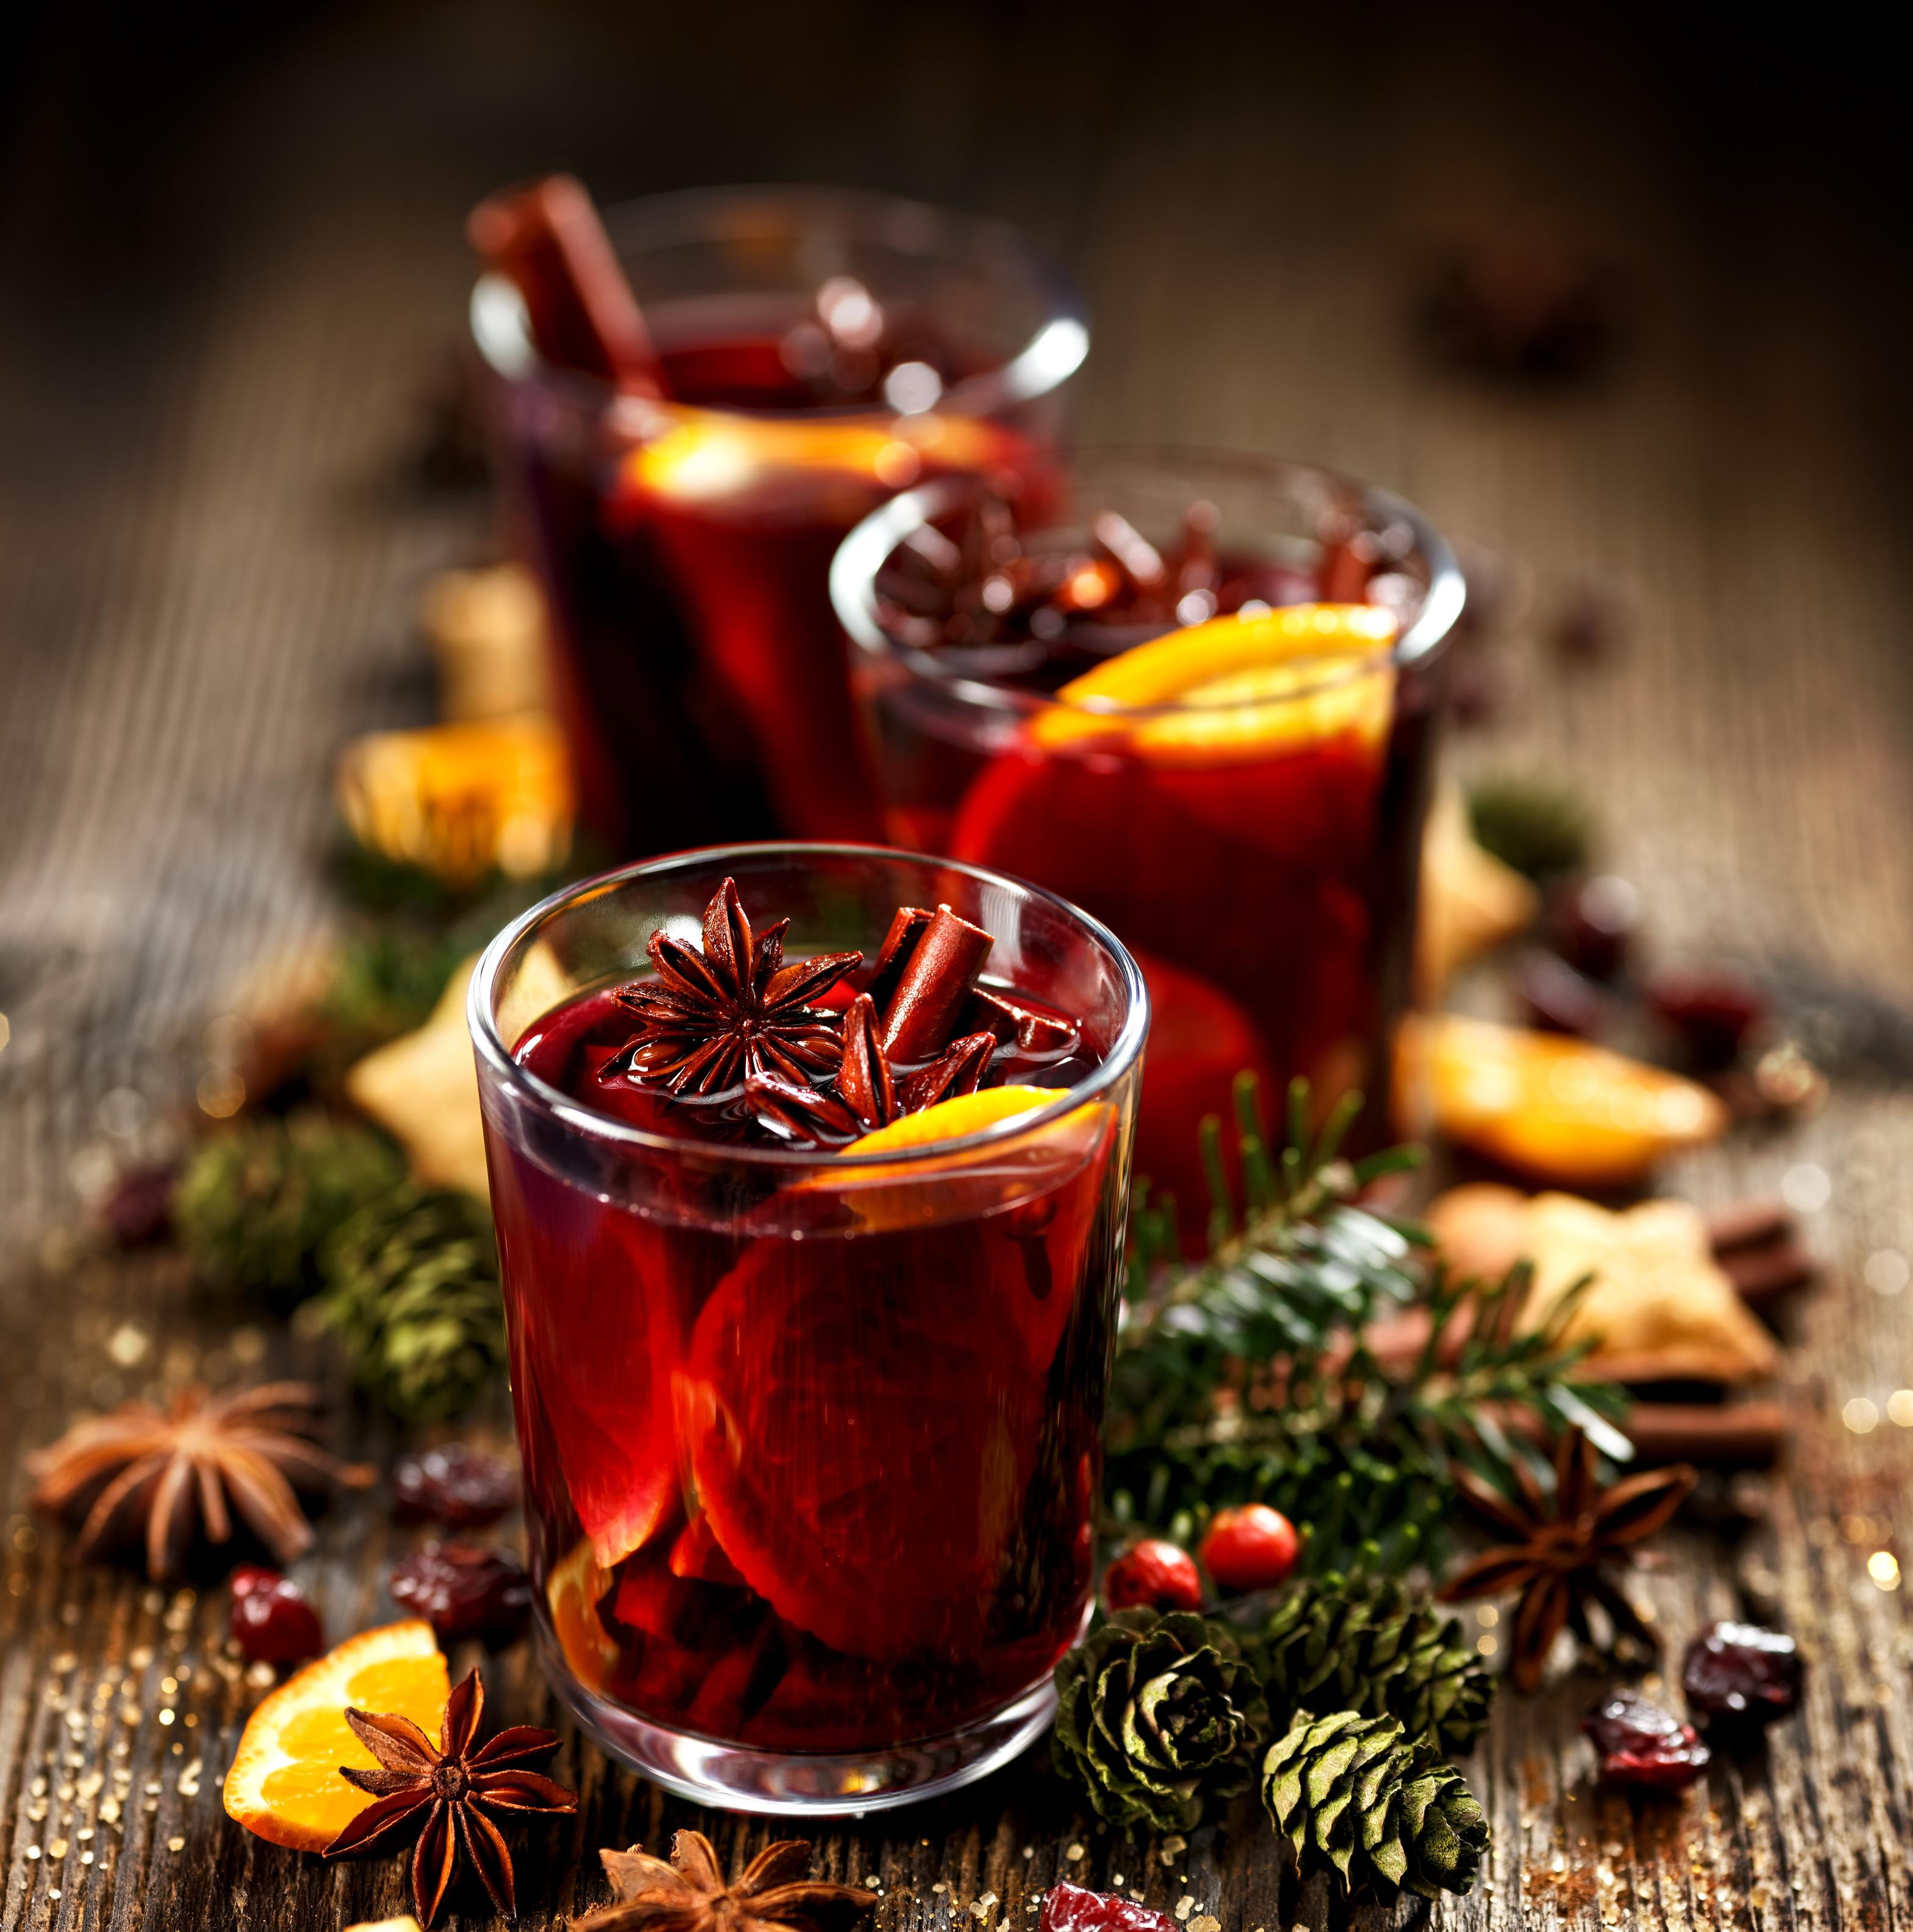 Christmas Mulled Wine  Crockpot Mulled Wine Tasty Bites